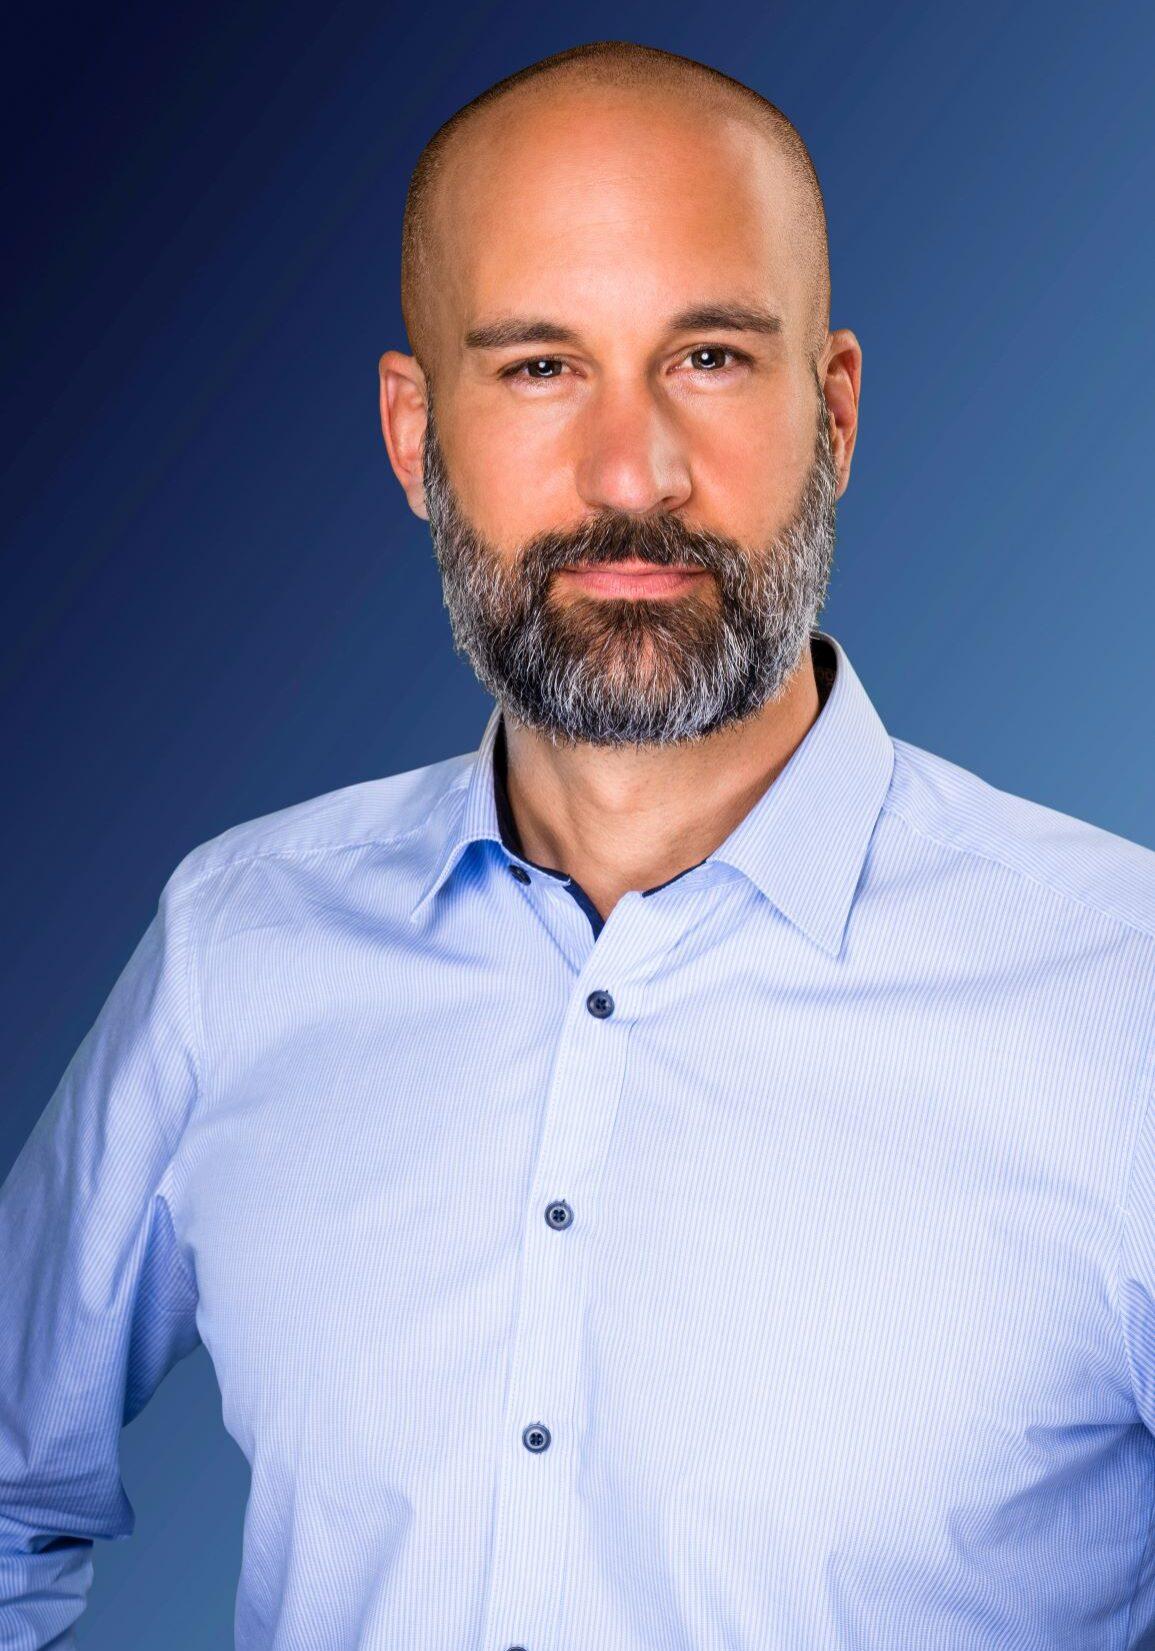 Marco S Maffei, lic. oec. HSG, founder   CEO, powernavi ecosystems of trust